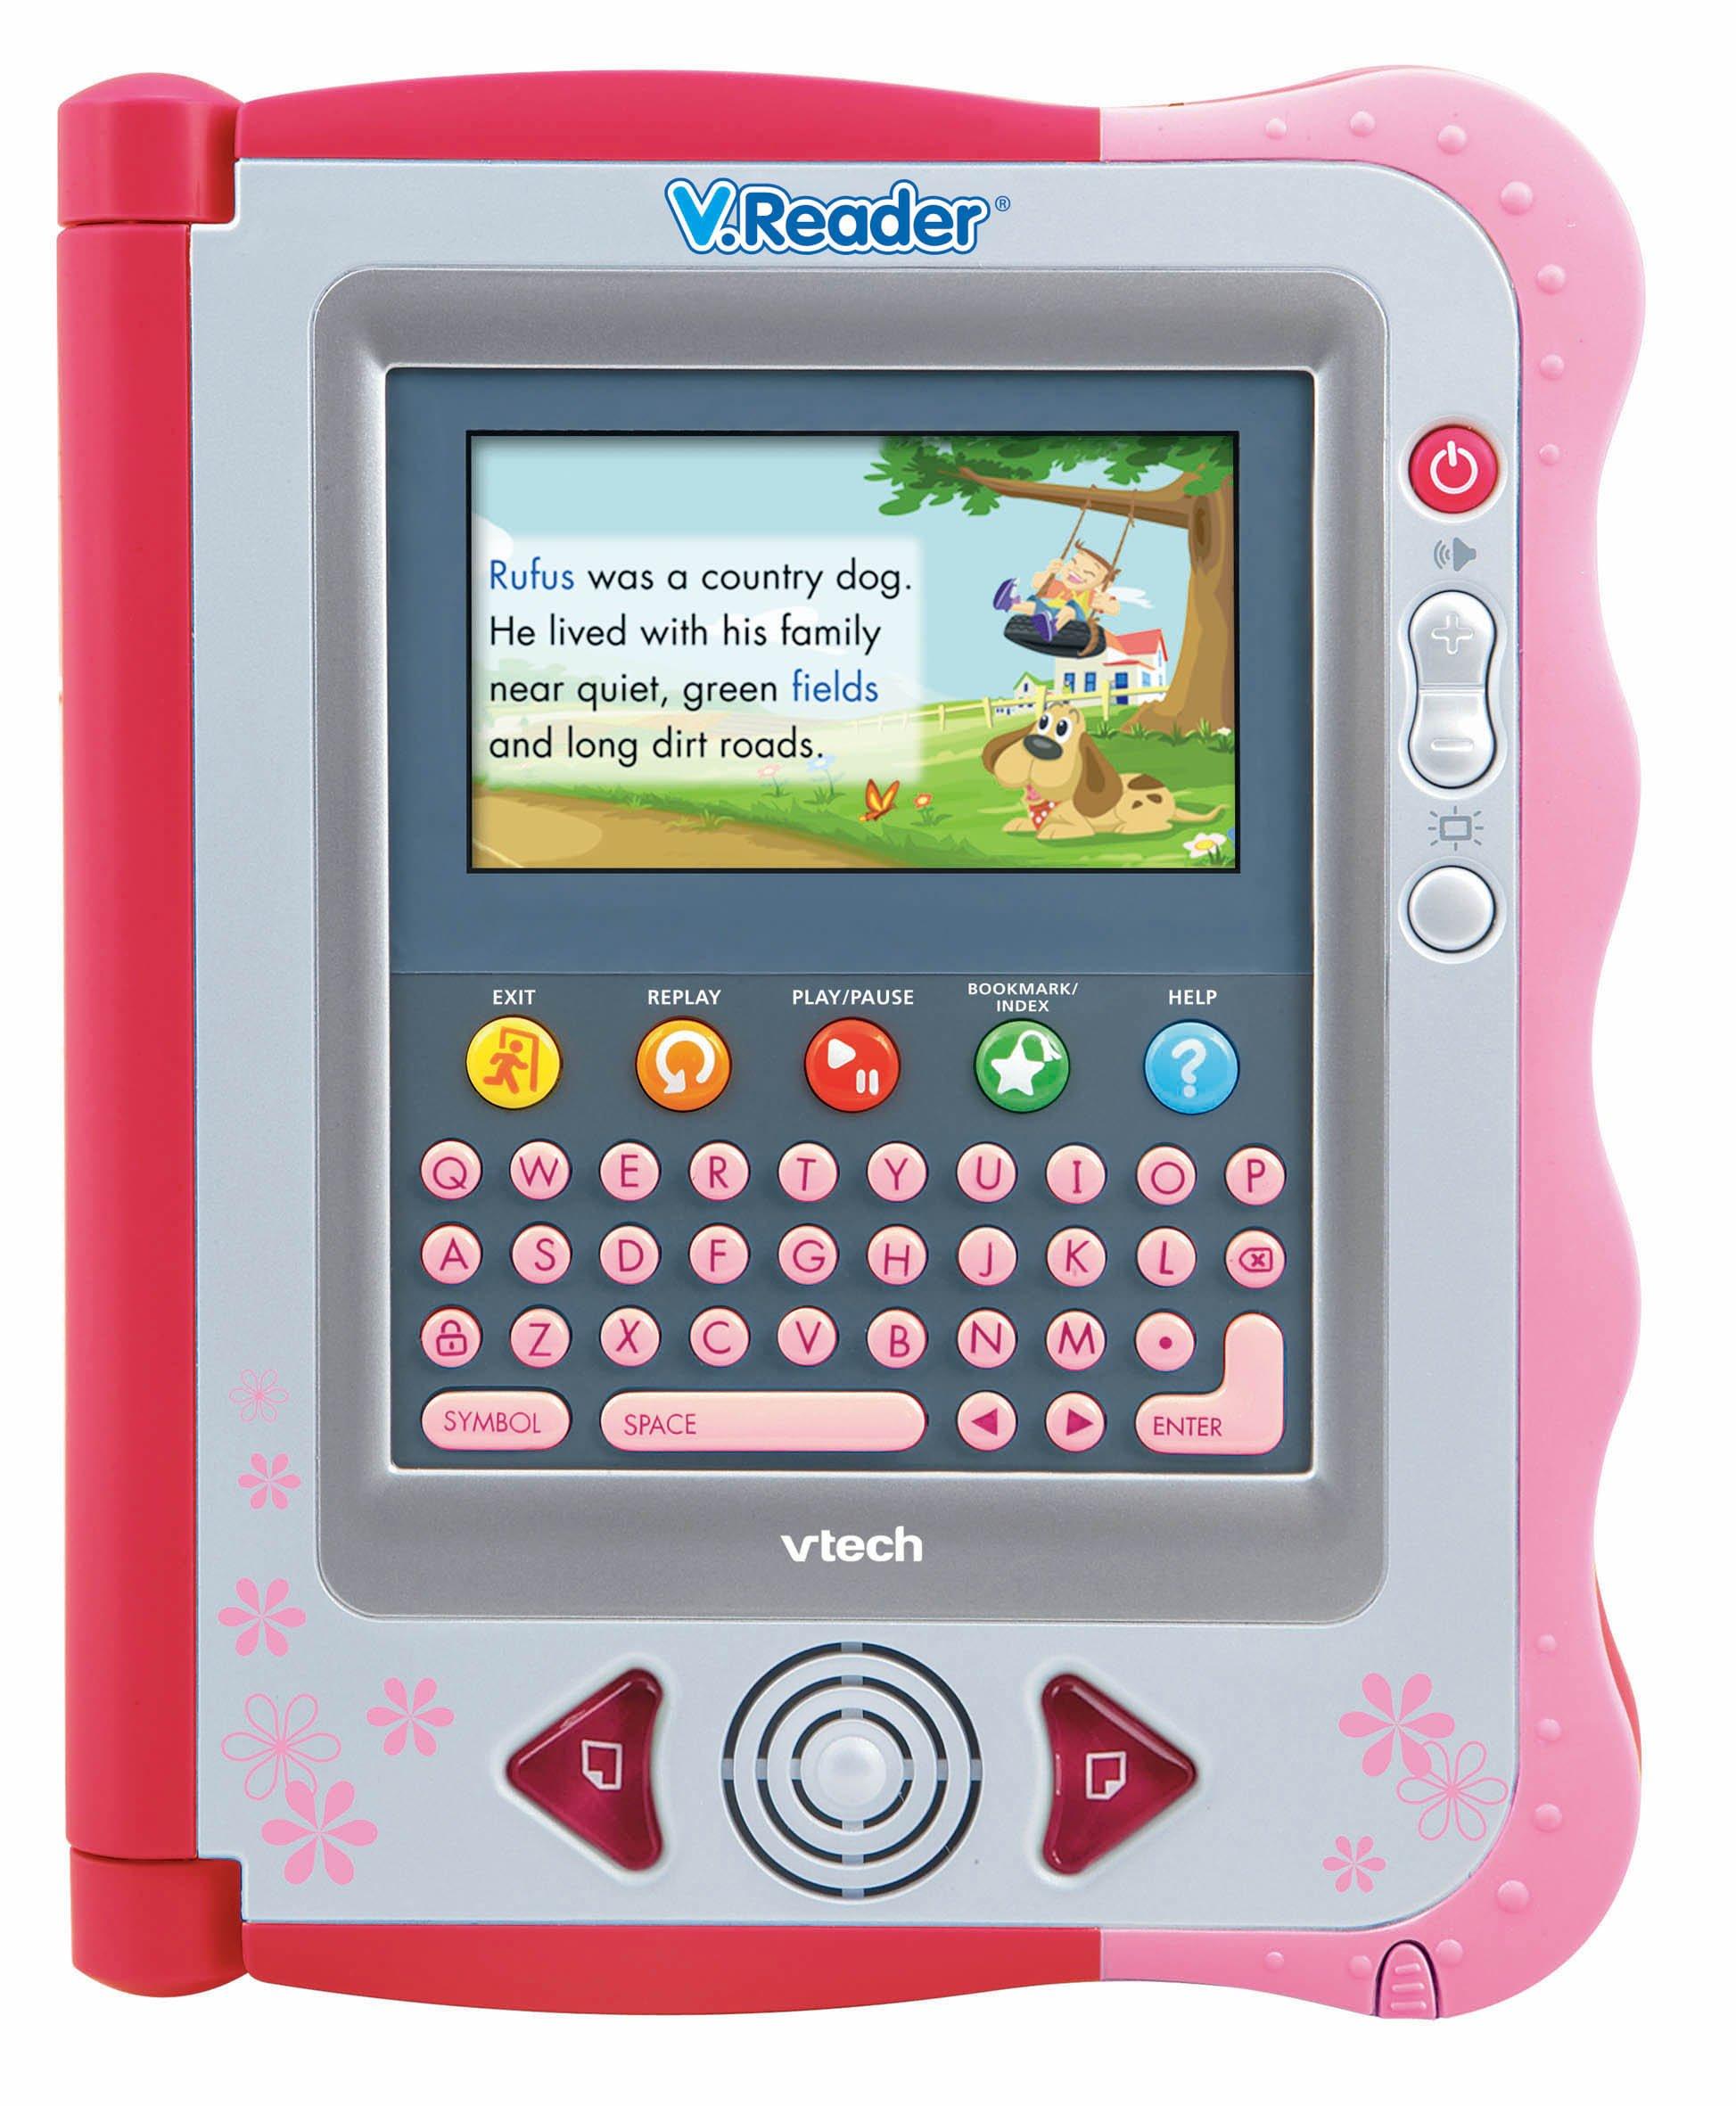 V.Reader Animated E-Book System - Pink by VTech (Image #1)